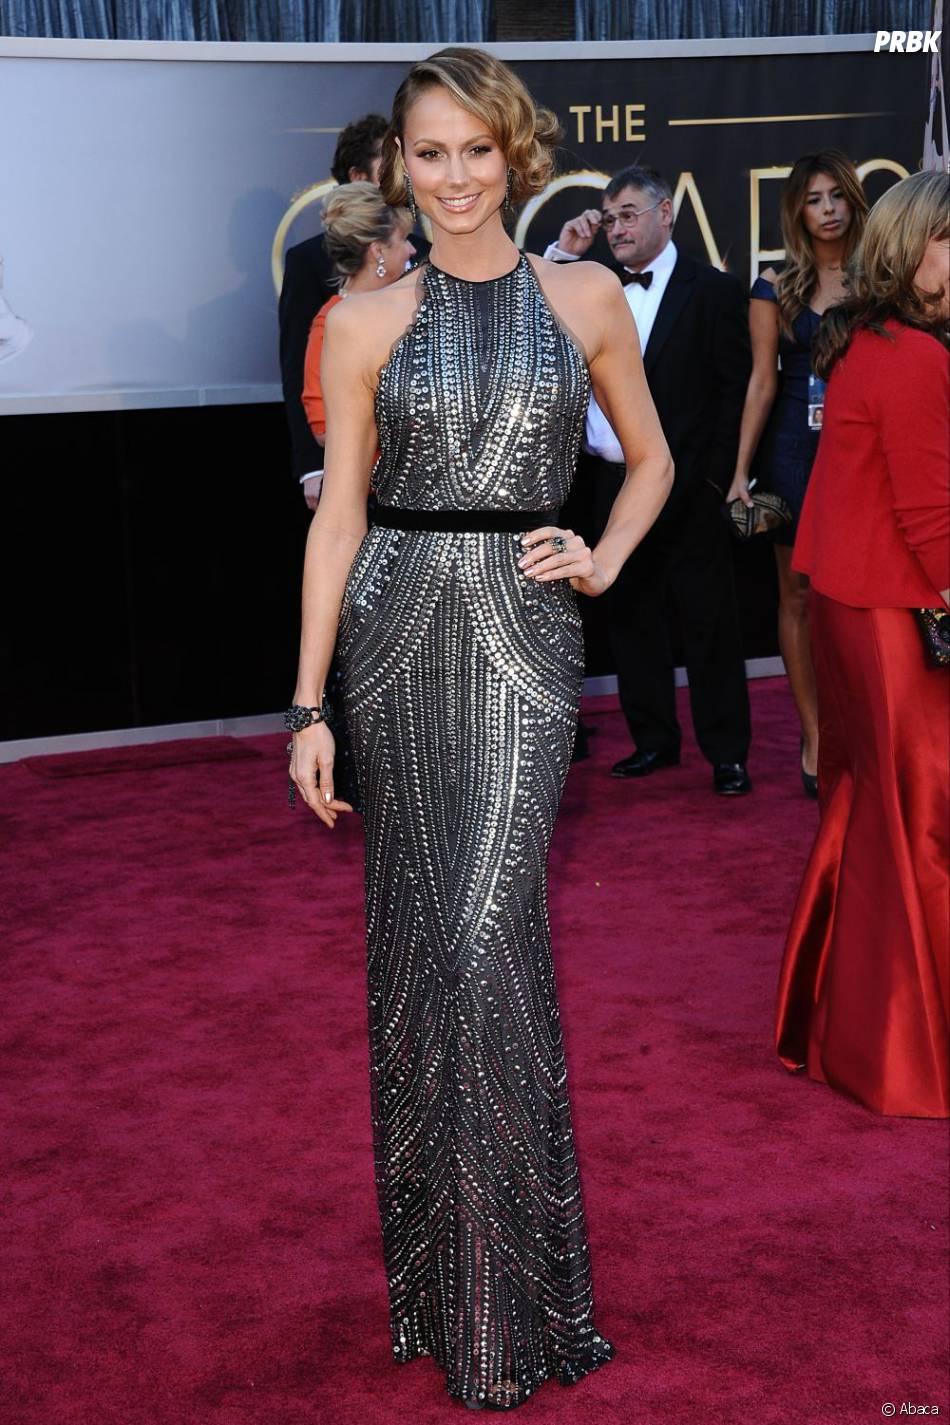 Stacy Keibler en Naeem Khan sur le tapis rouge des Oscars 2013 : Juste sublime !